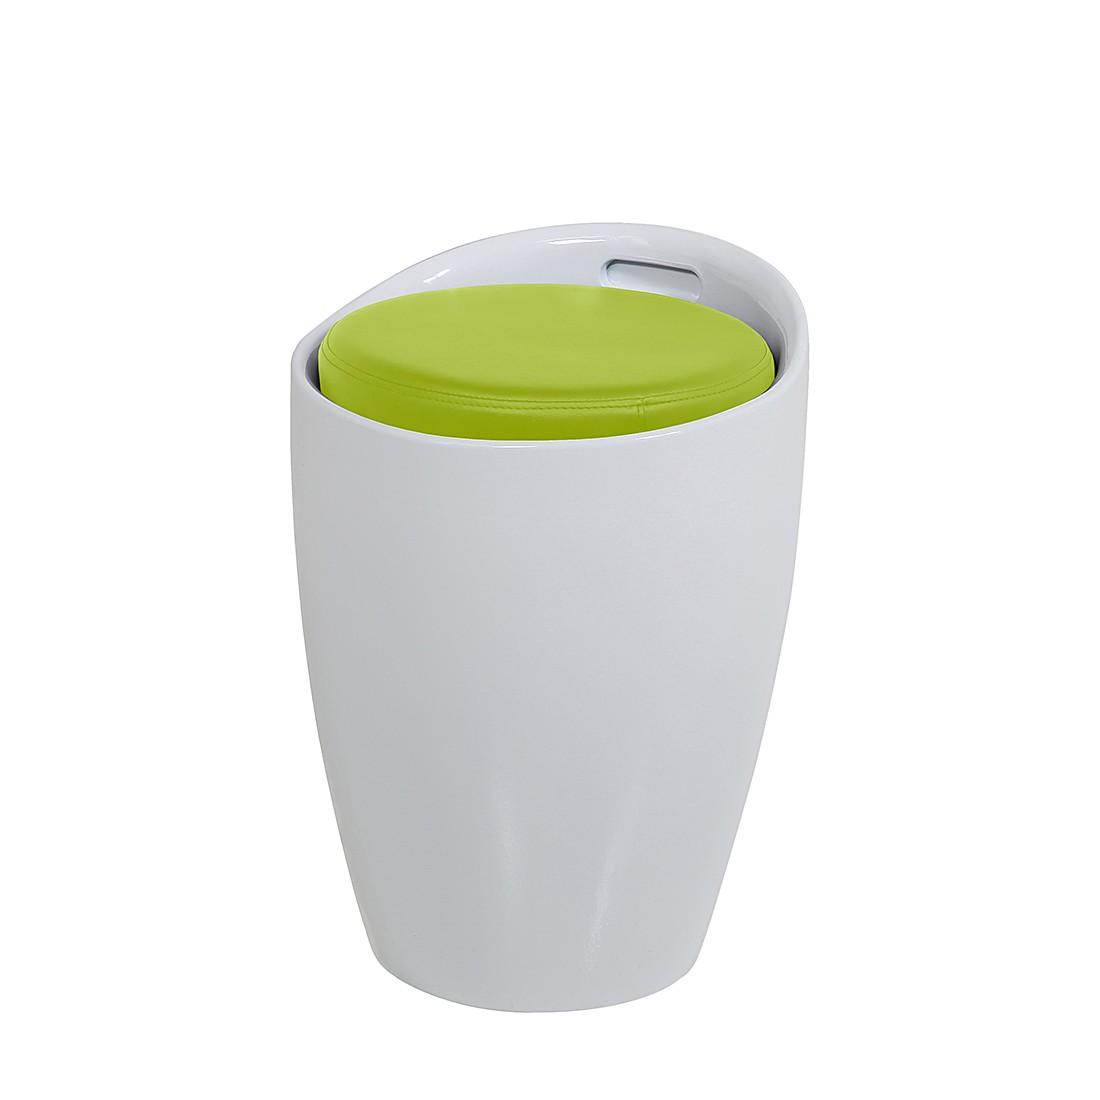 Hocker Honolulu – Kunststoff/Kunstleder – Weiß/Hellgrün, Fredriks günstig kaufen